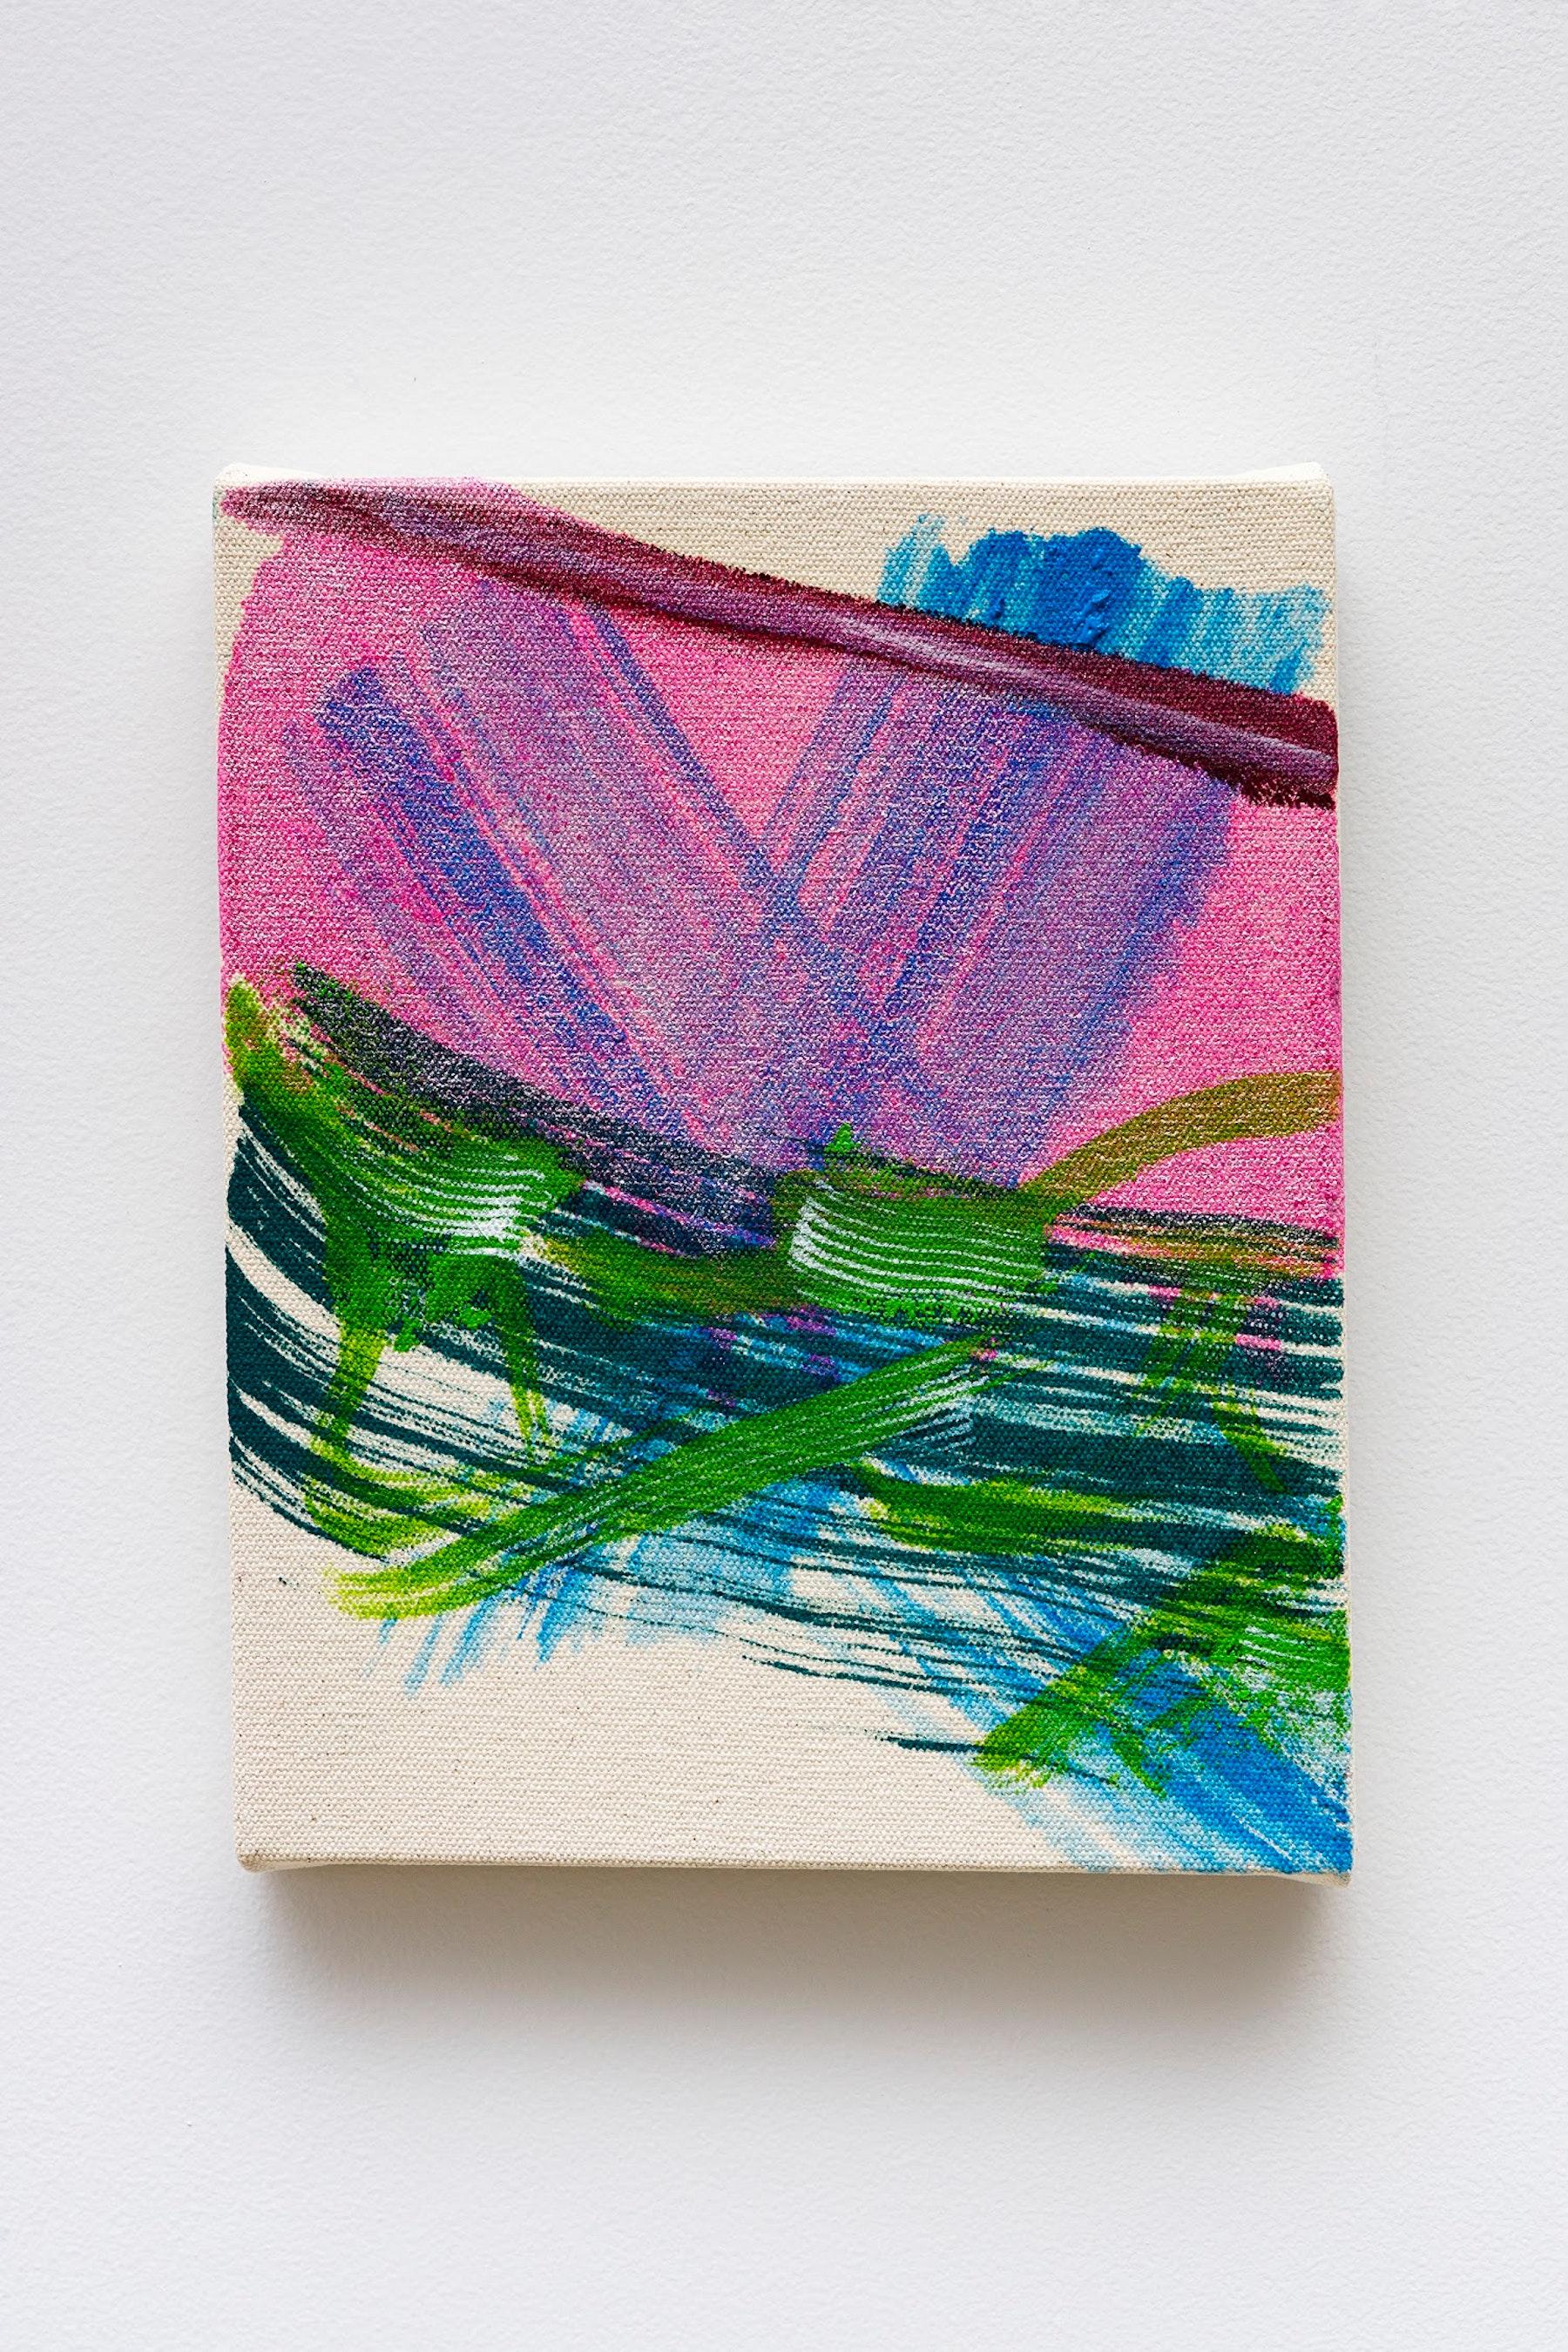 "Monique Van Genderen ""Untitled,"" 2020 Oil on canvas 10 x 8"" [HxW] (25.4 x 20.32 cm) Inventory #VGE398 Courtesy of the artist and Vielmetter Los Angeles Photo credit: Jeff Mclane"